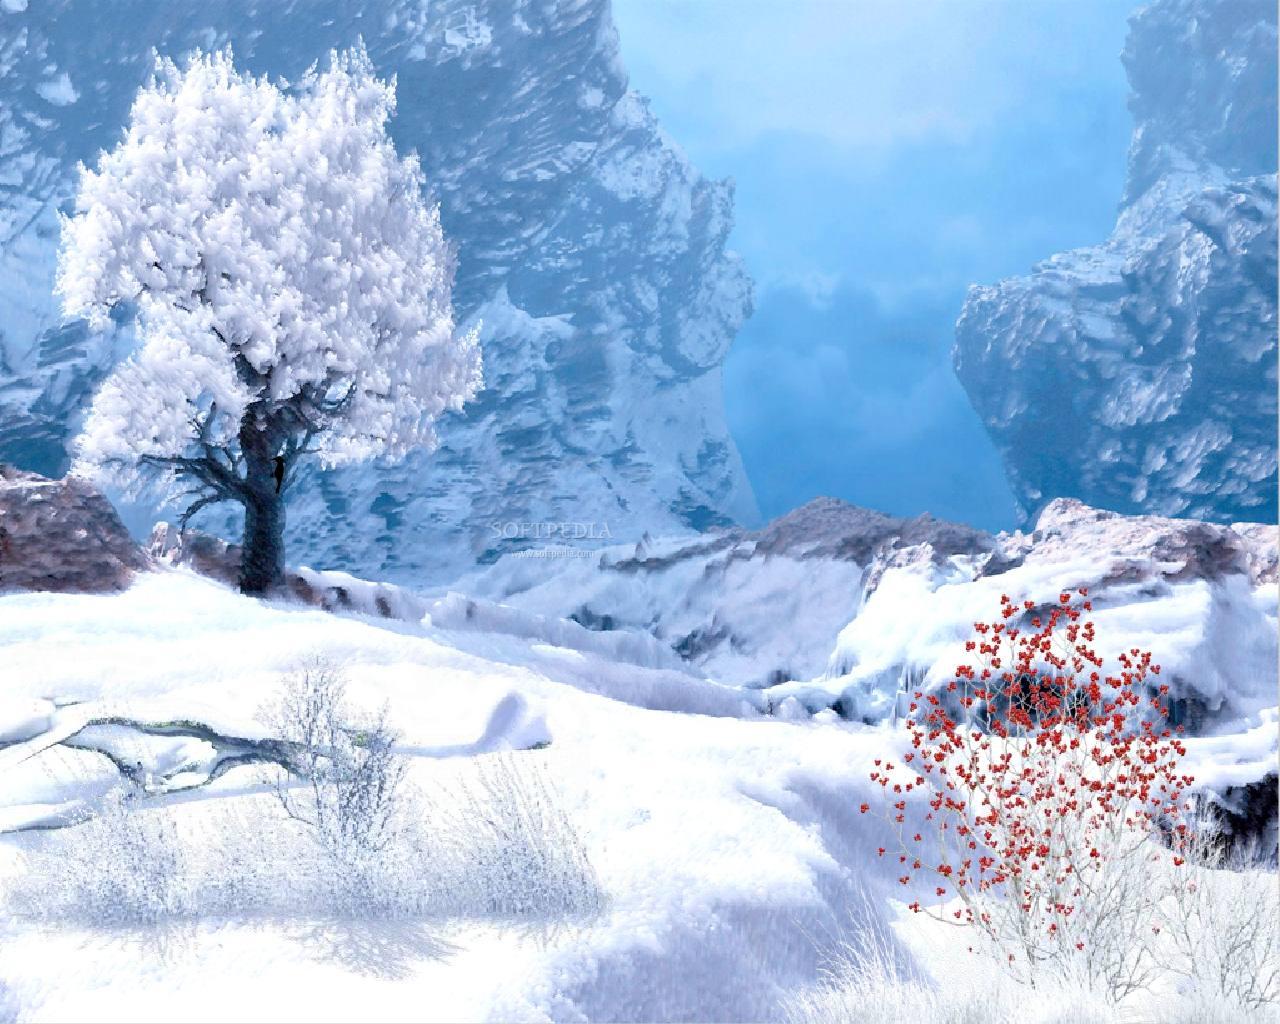 Winter in Mountain Animated Wallpaper Urban Art Wallpaper 1280x1024